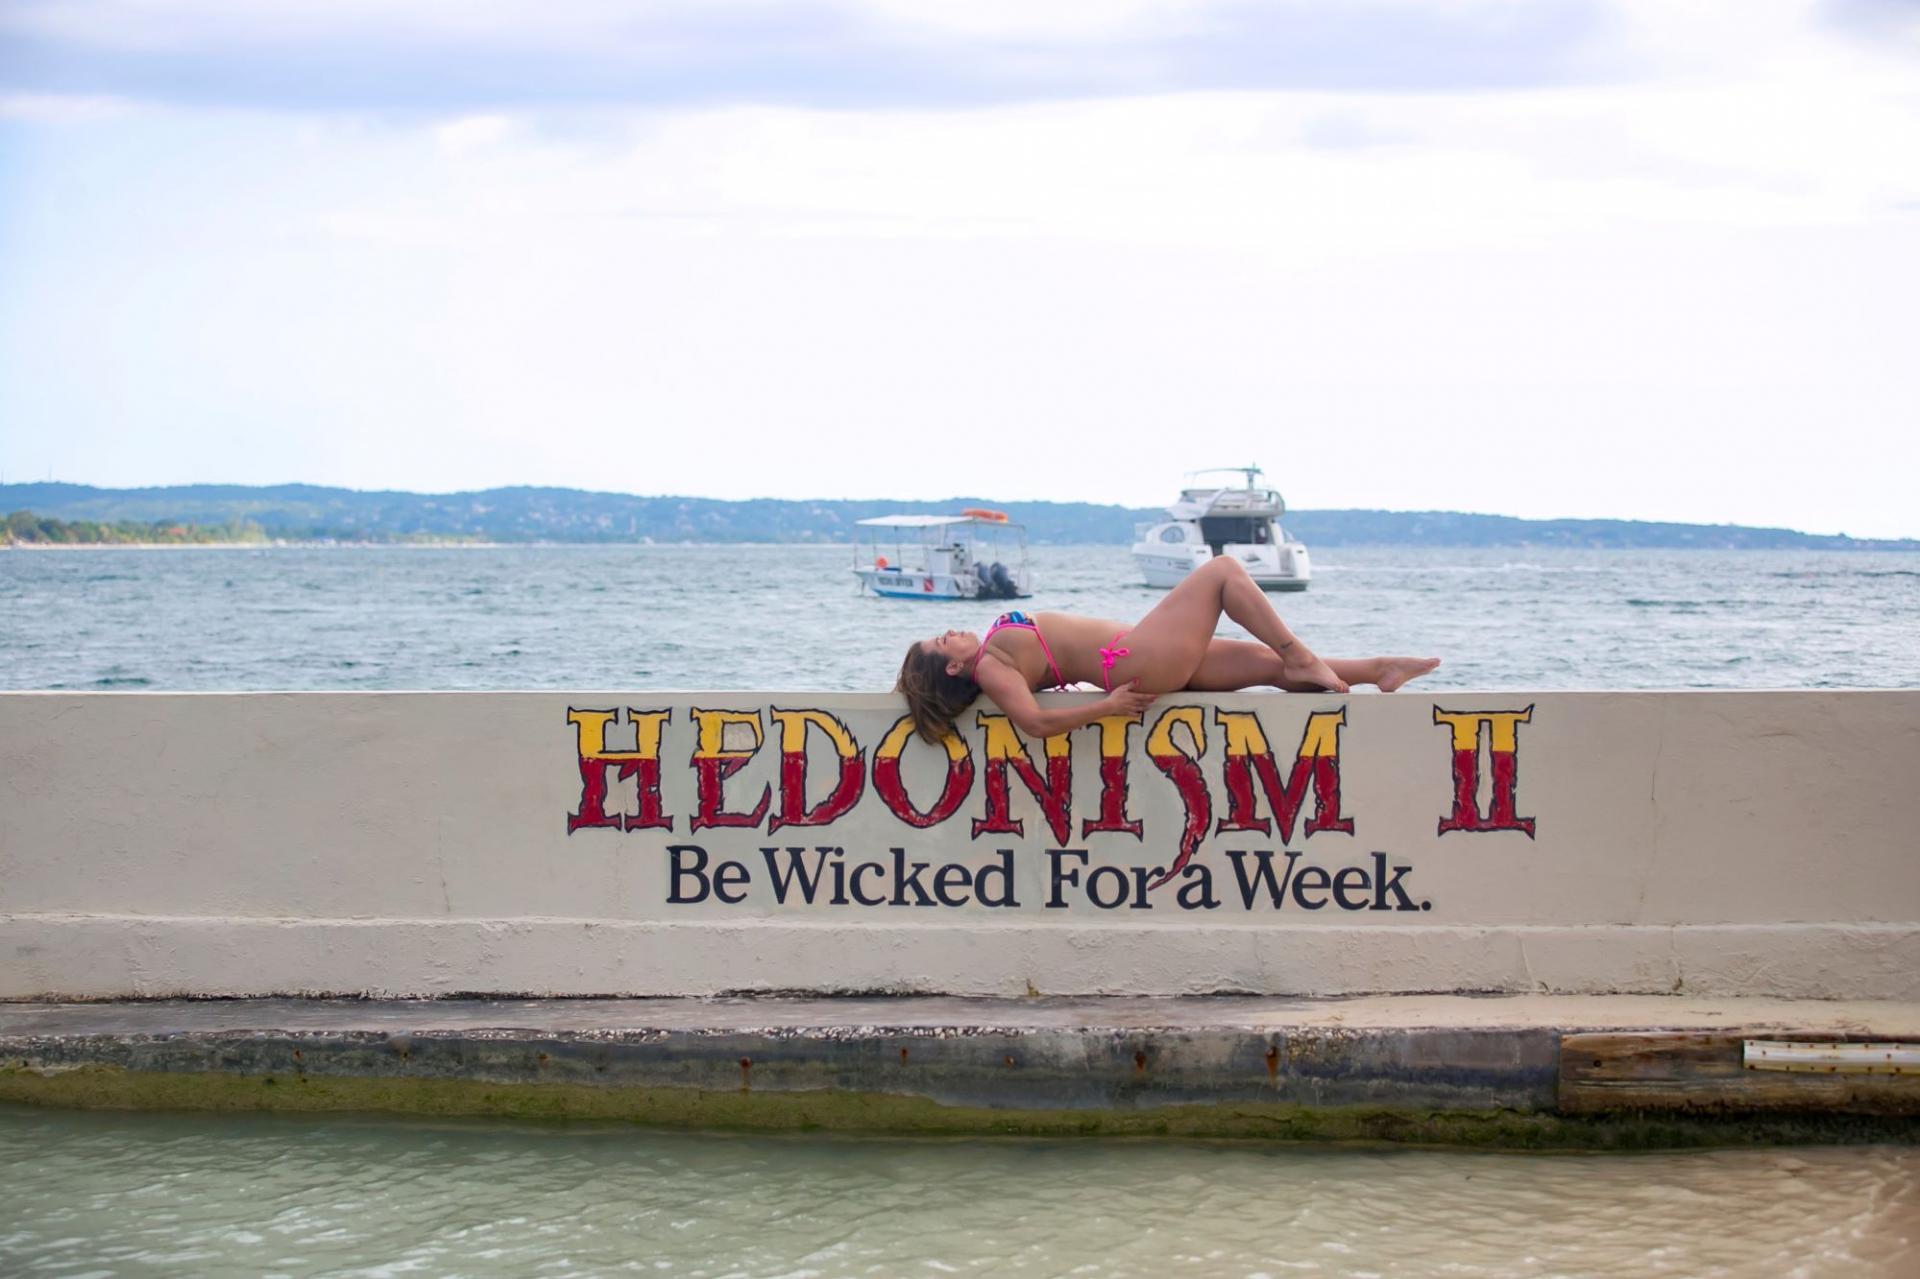 SDC ASN Lifestyle Magazine Chris Chrissy Vee Hedo Swingers Nudist Resort